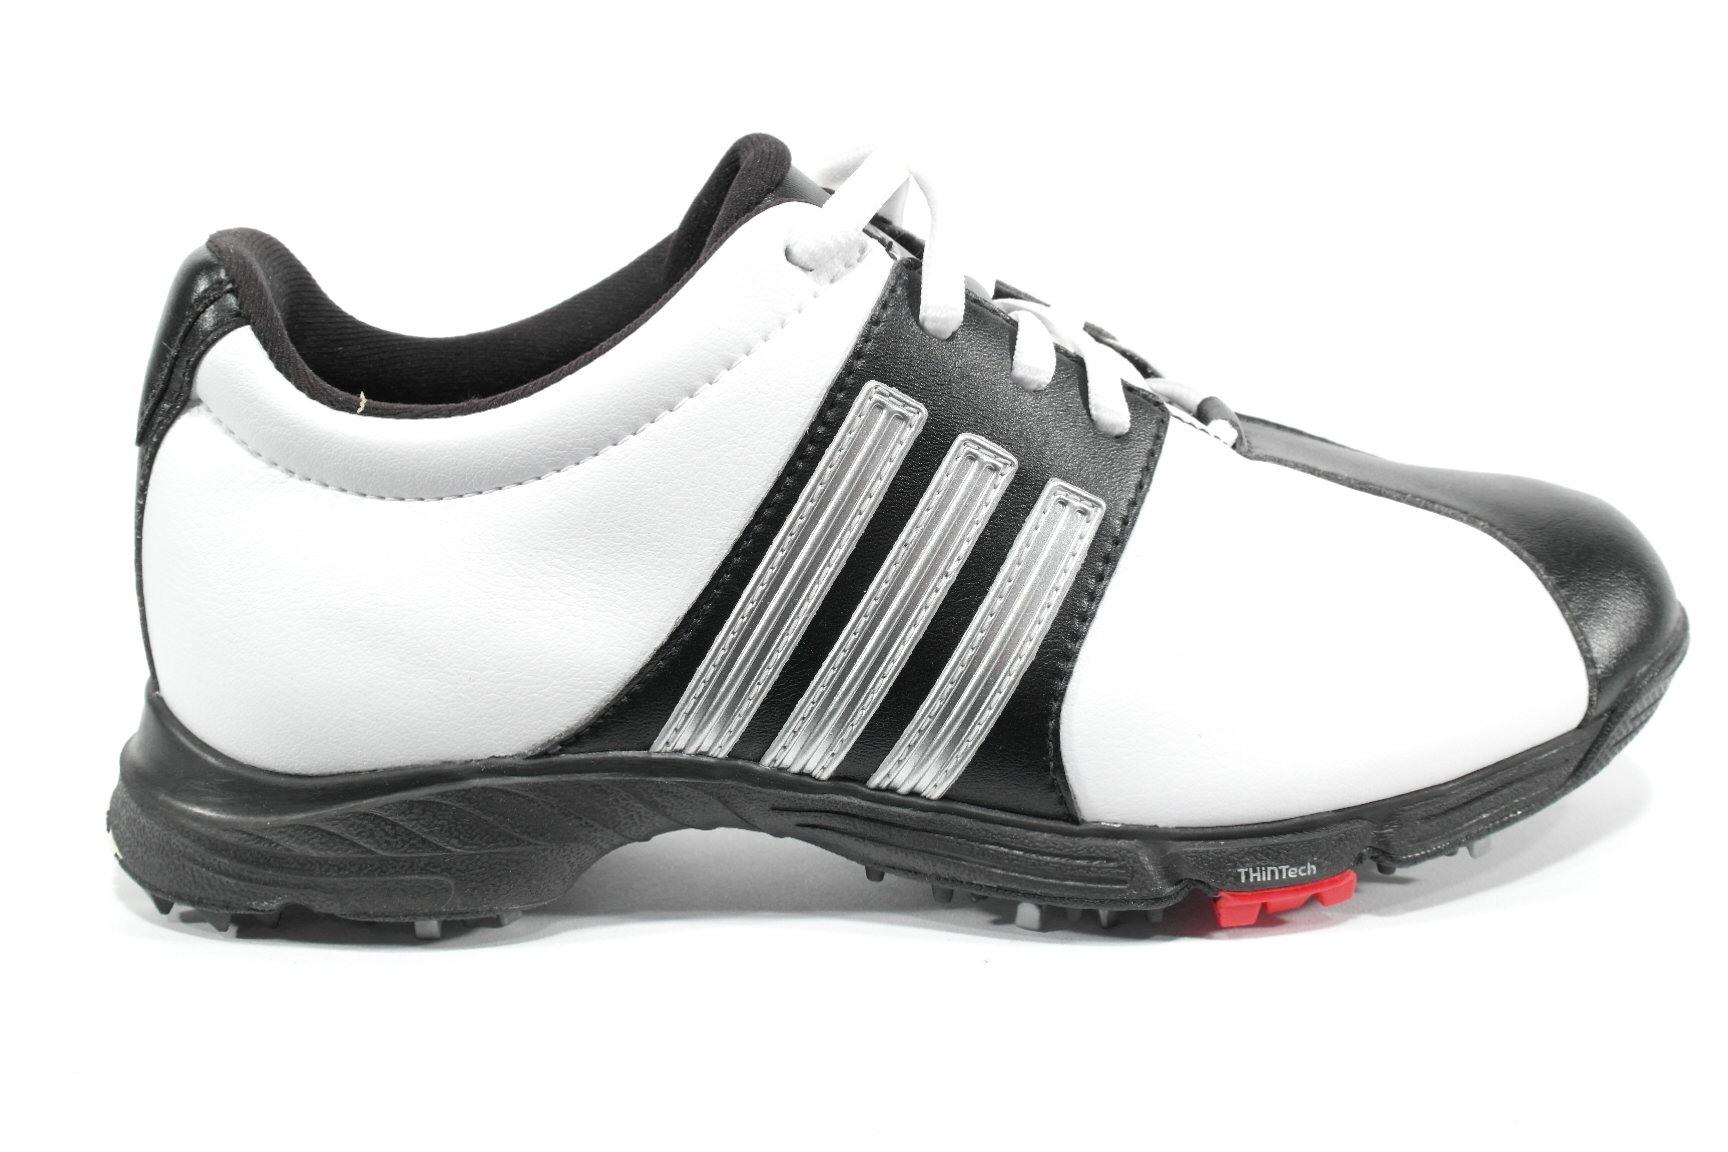 Junior golf schoen Adidas Golf was 816367